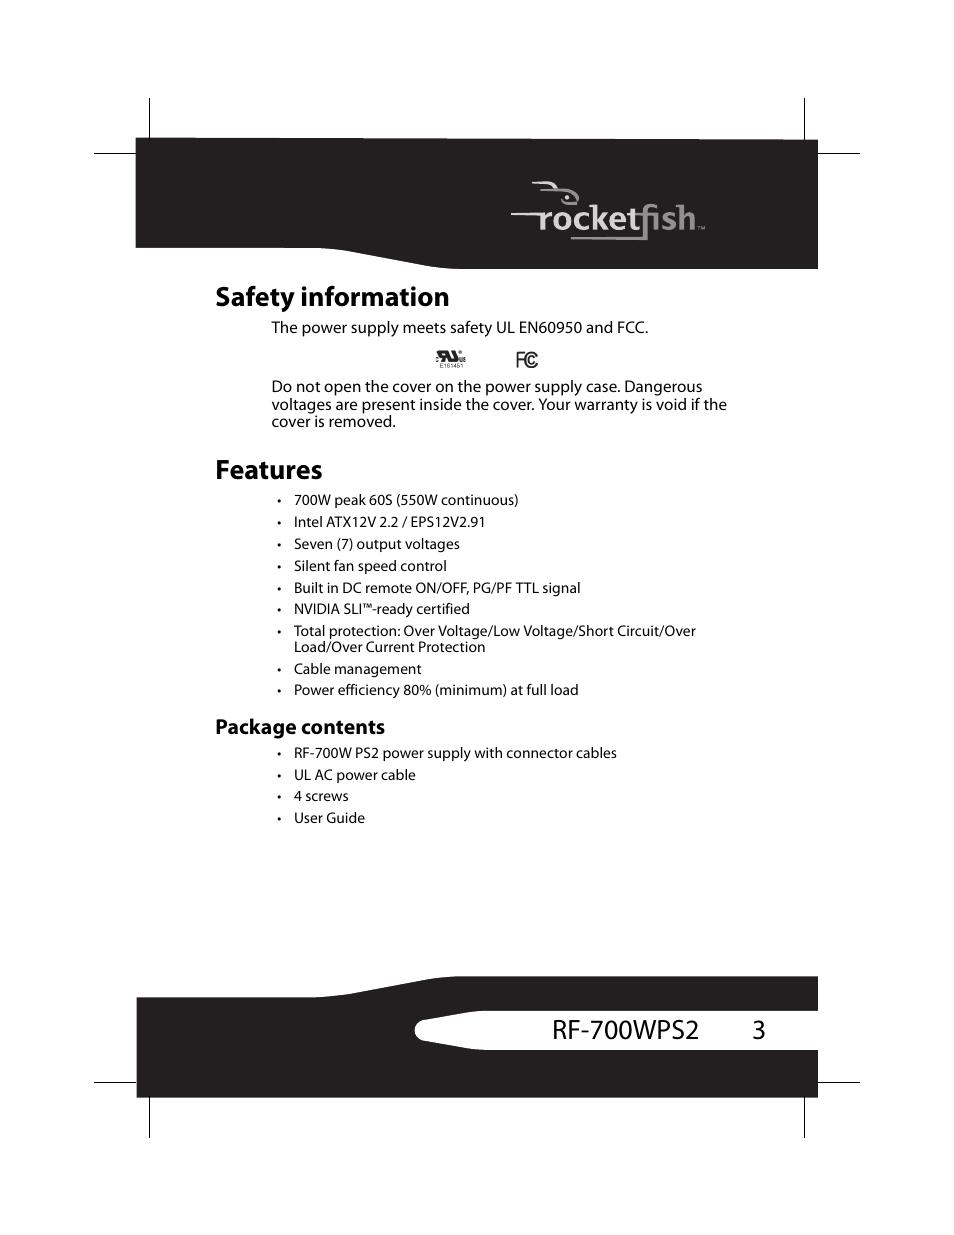 safety information features package contents rocketfish rf rh manualsdir com Rocketfish Wireless Speakers for TV Rocketfish Wireless Speakers for TV